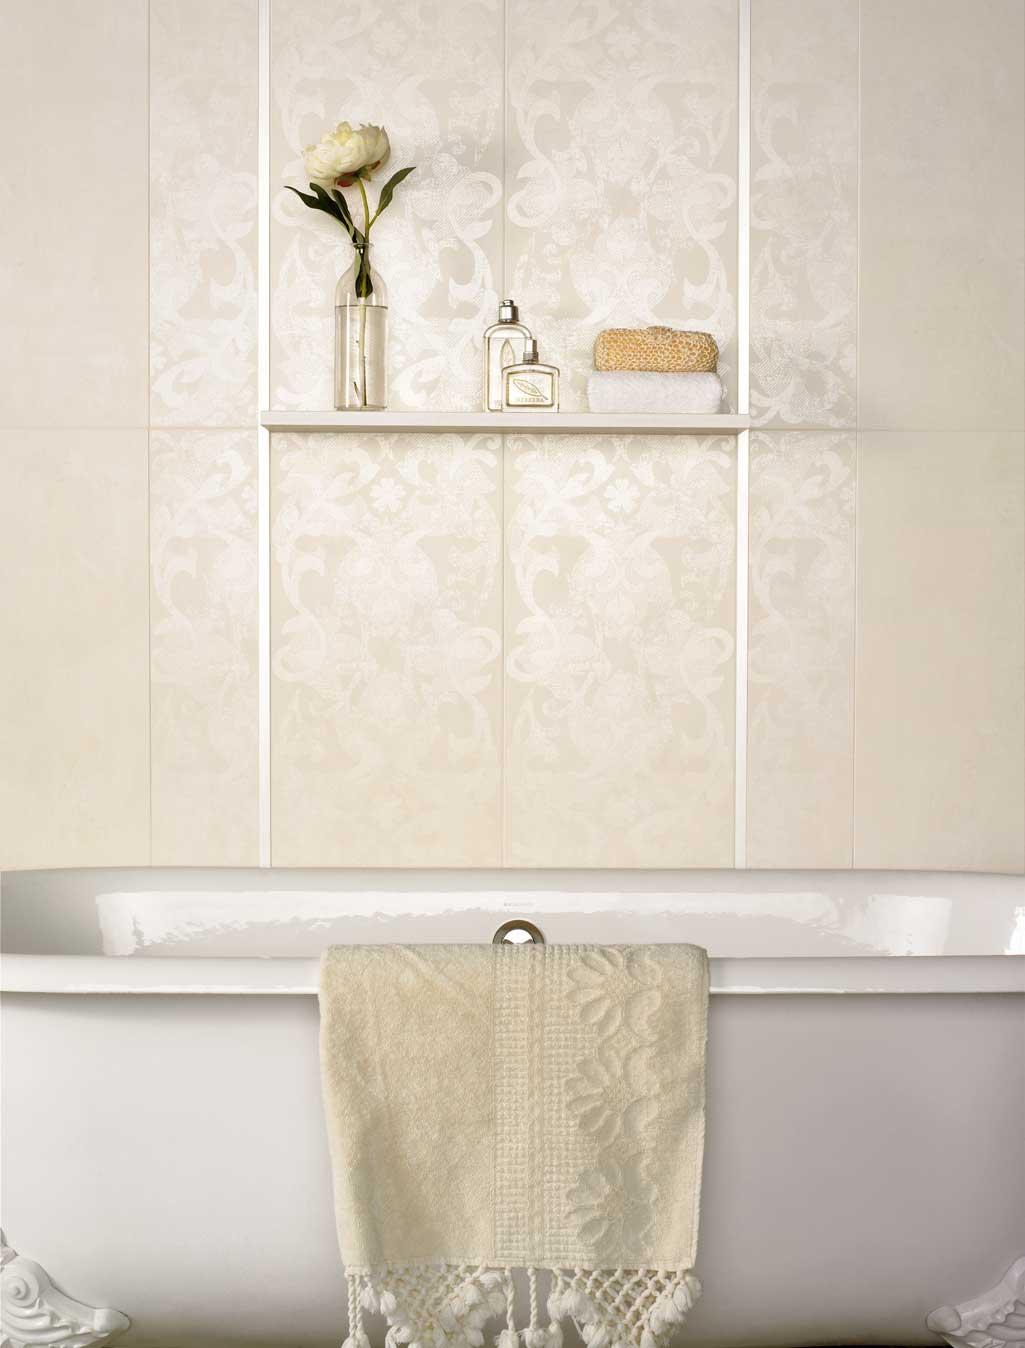 Baño estilo nórdico con bañera en tonos totalmente blancos.